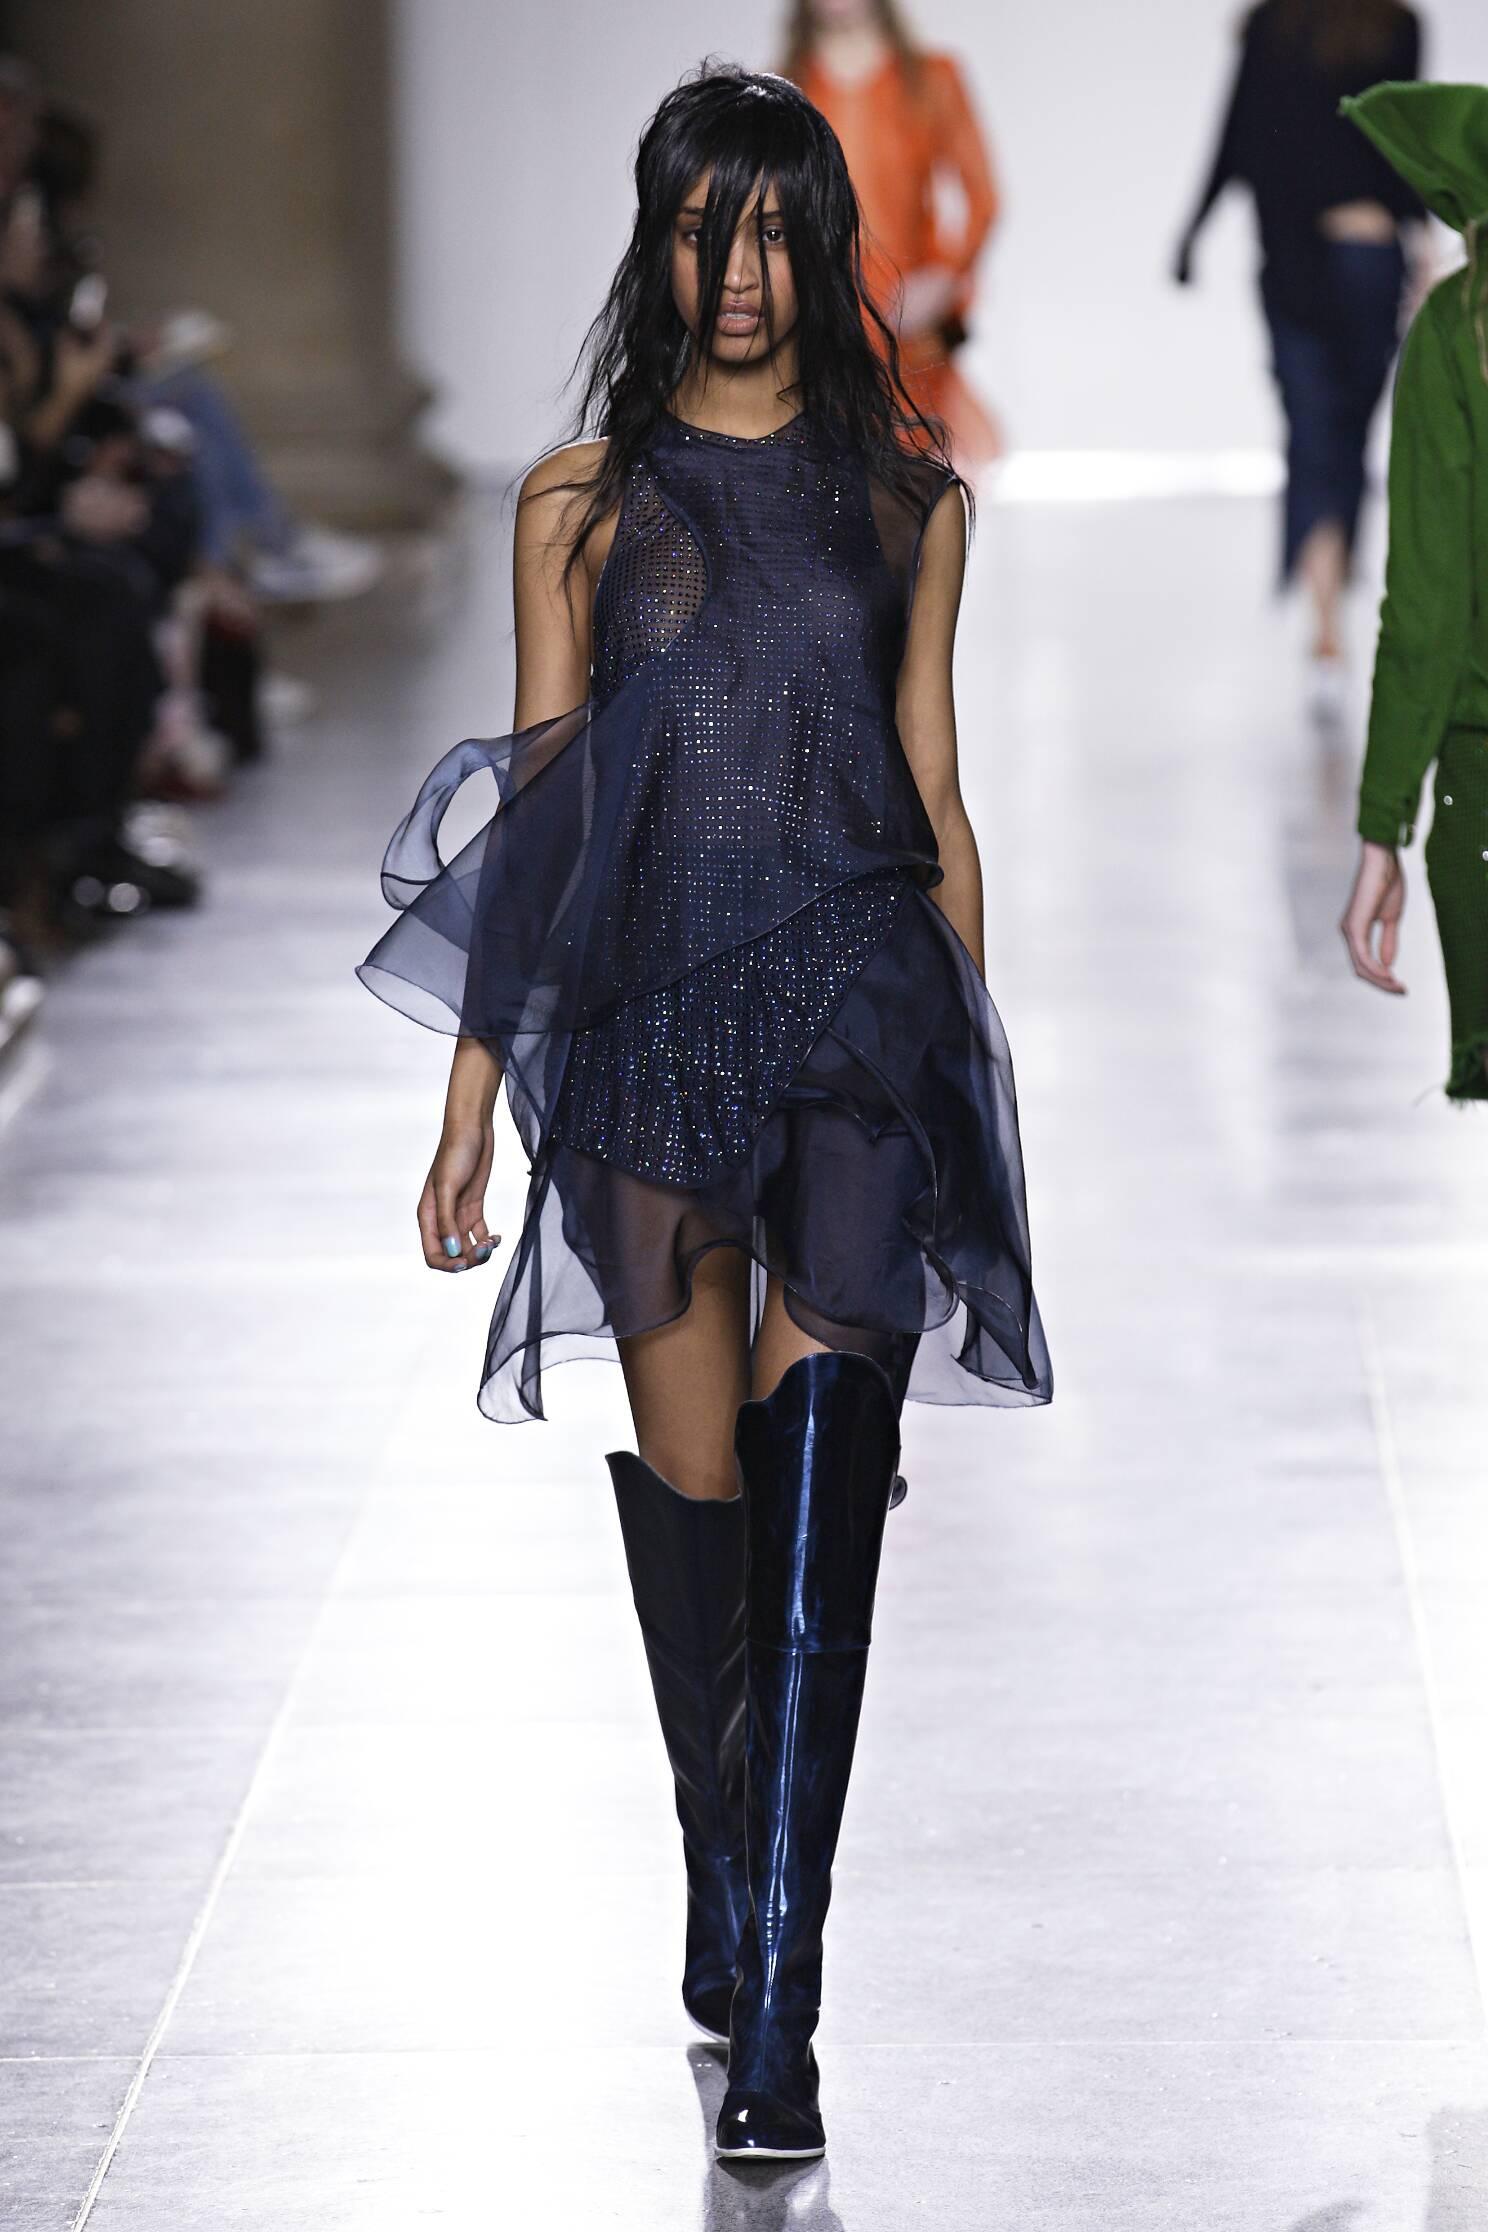 Runway Marques Almeida Fall Winter 2015 16 Women's Collection London Fashion Week